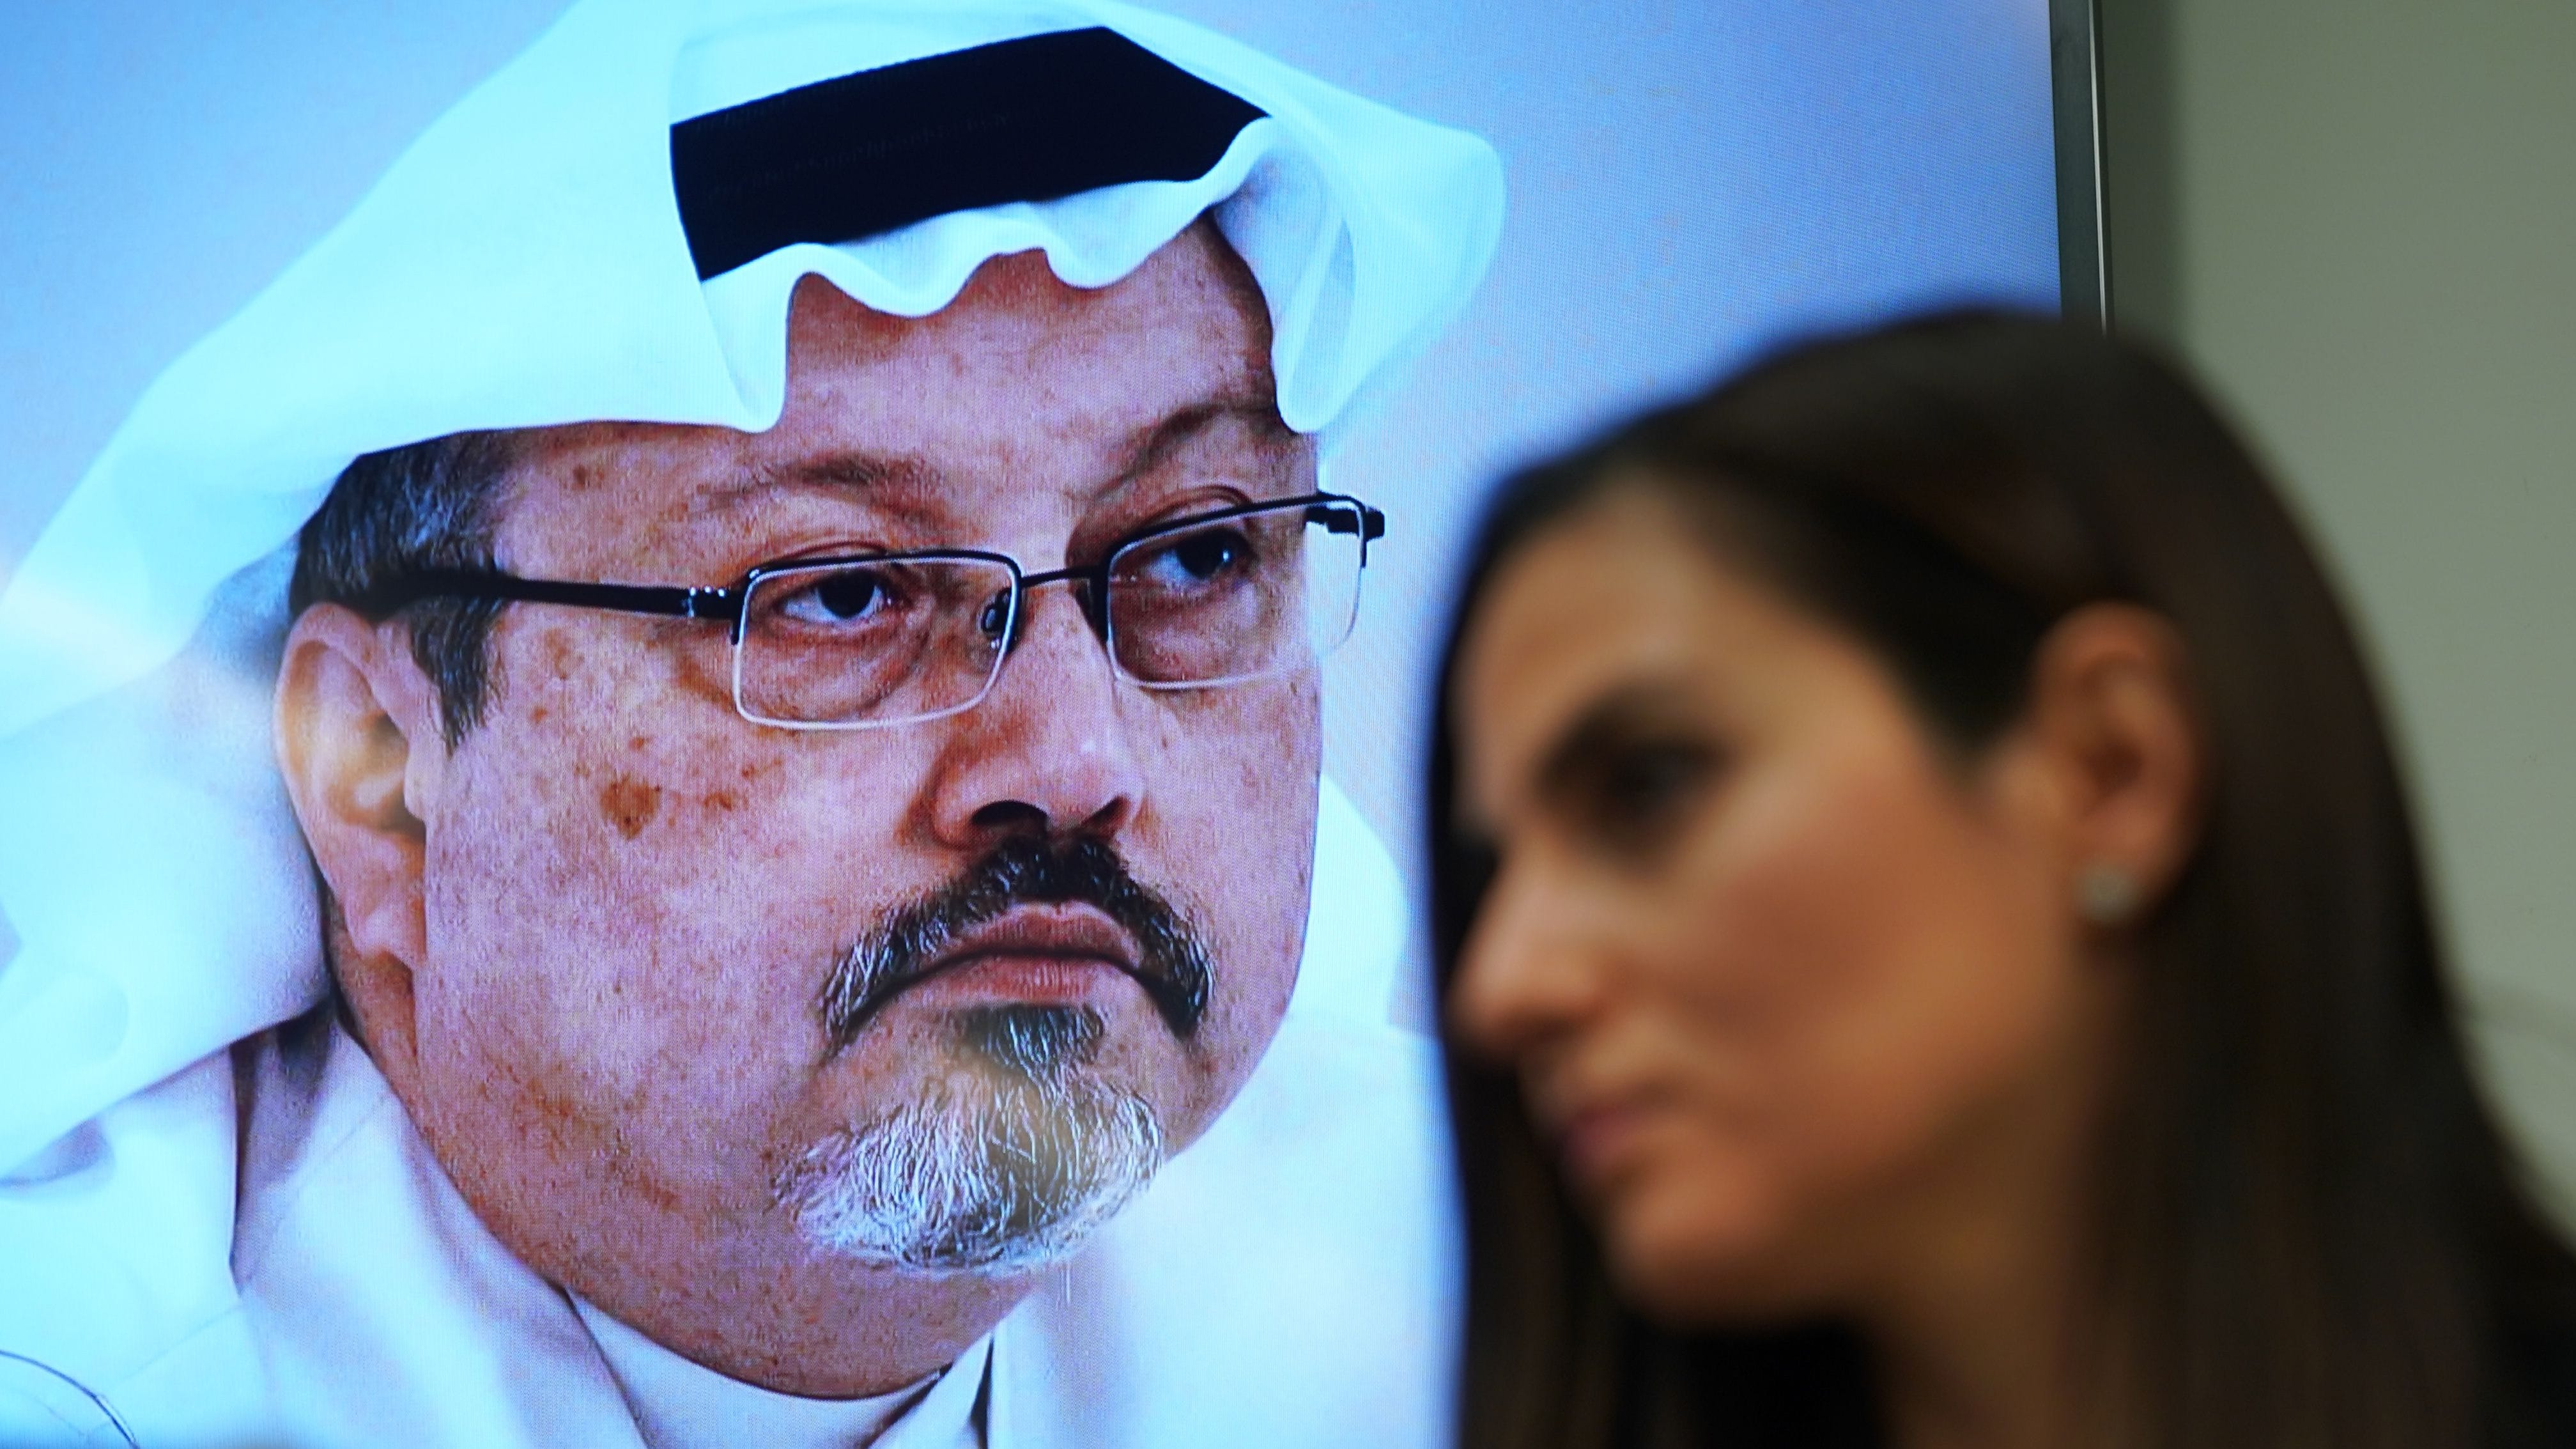 Who is Jamal Khashoggi? Royal court confidant and prominent Saudi journalist turned reluctant dissident